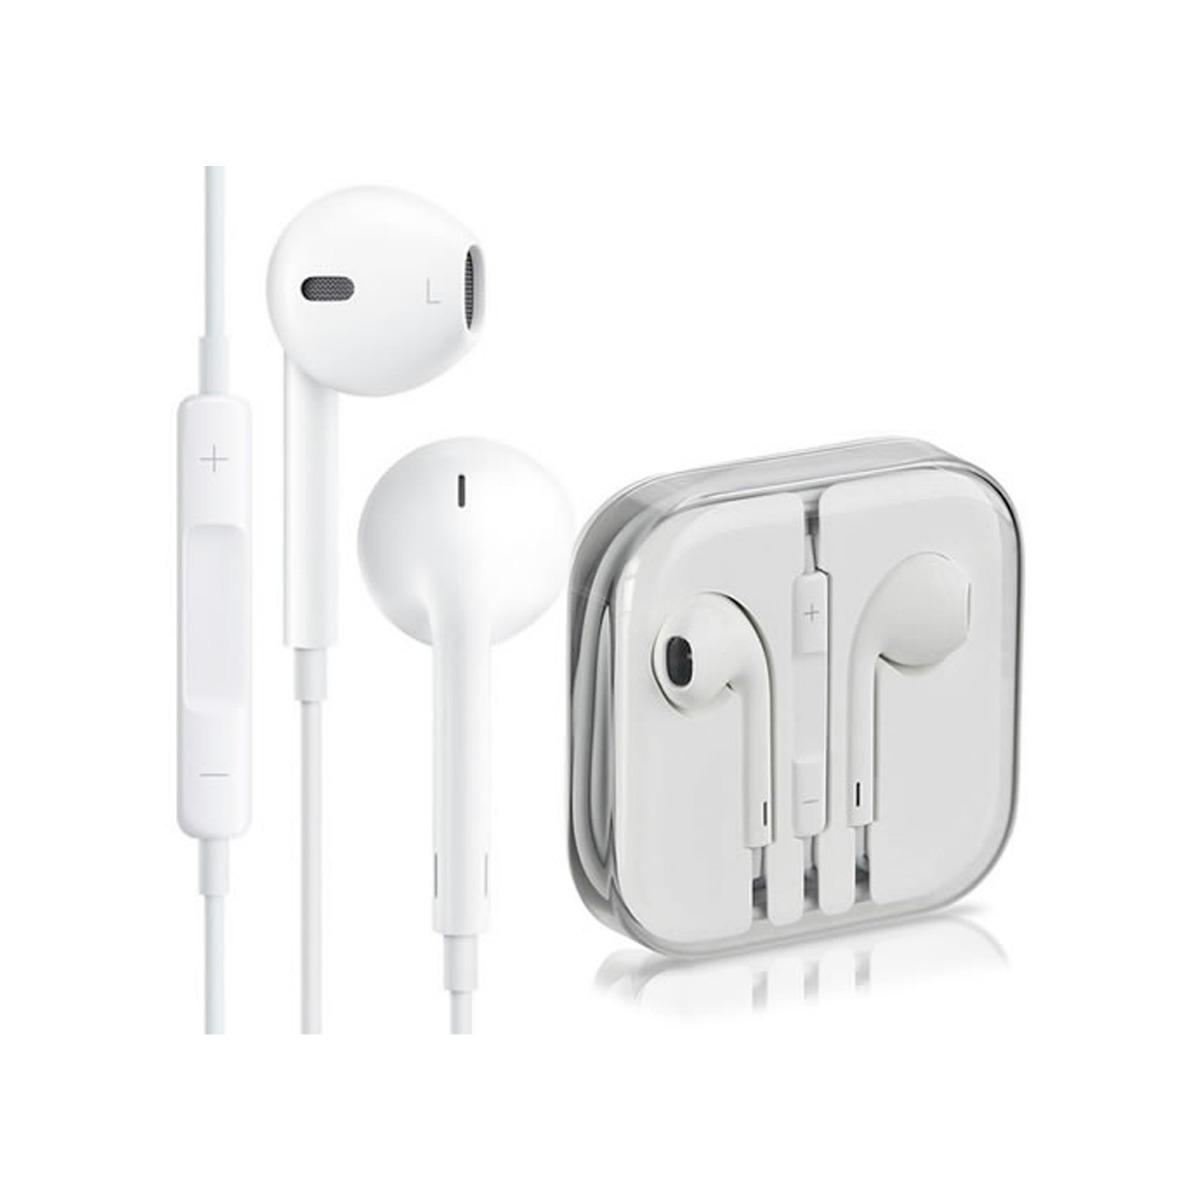 94b63b14f6f audifonos apple iphone original earpods jack 3.5mm microfono. Cargando zoom.